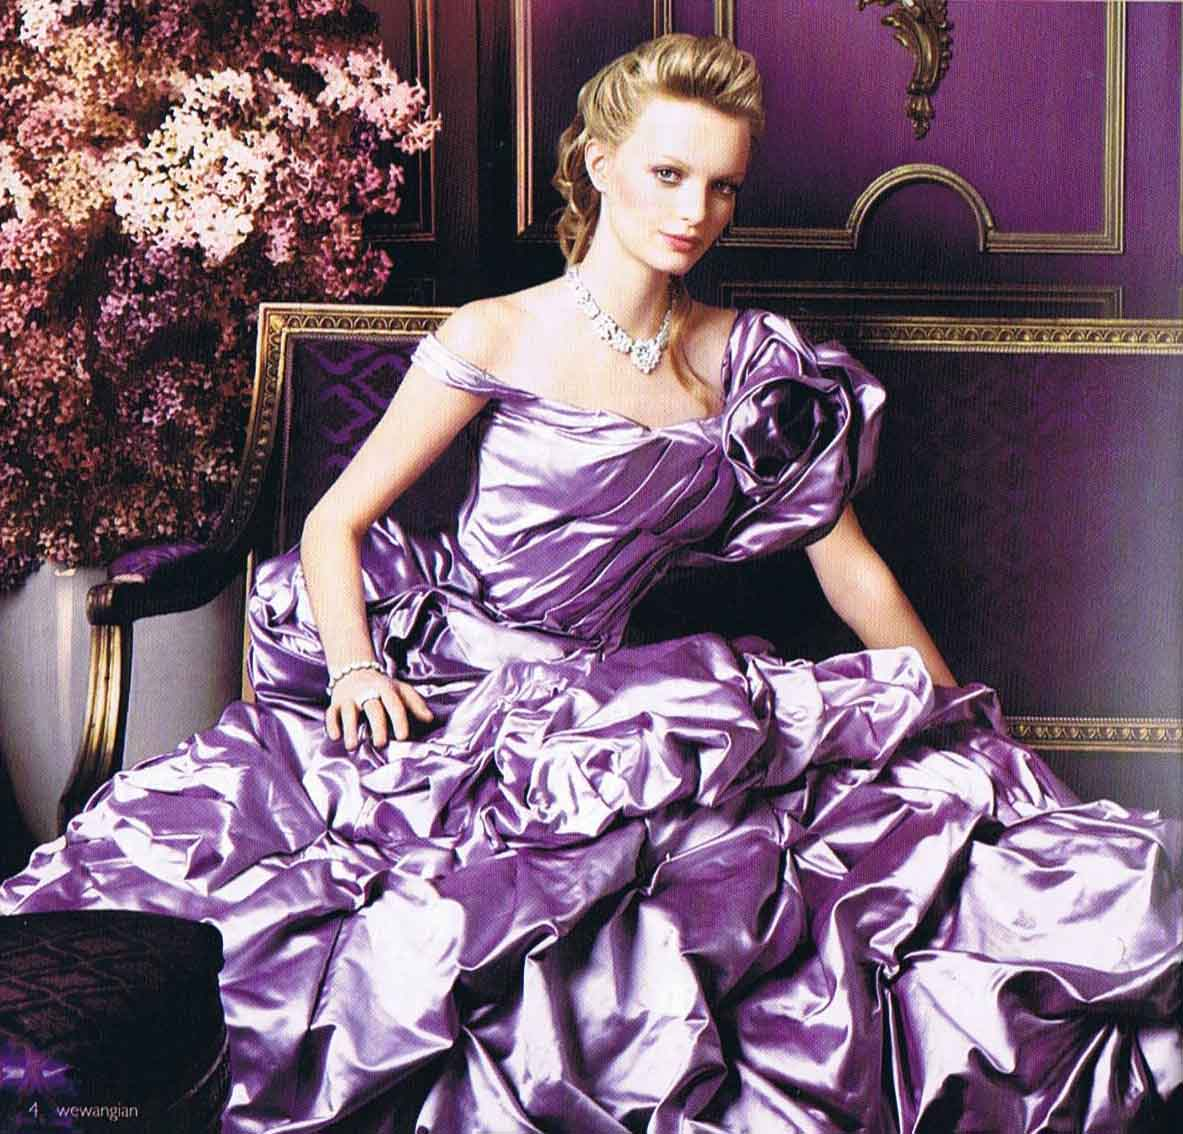 purple wedding dress-Knitting Gallery